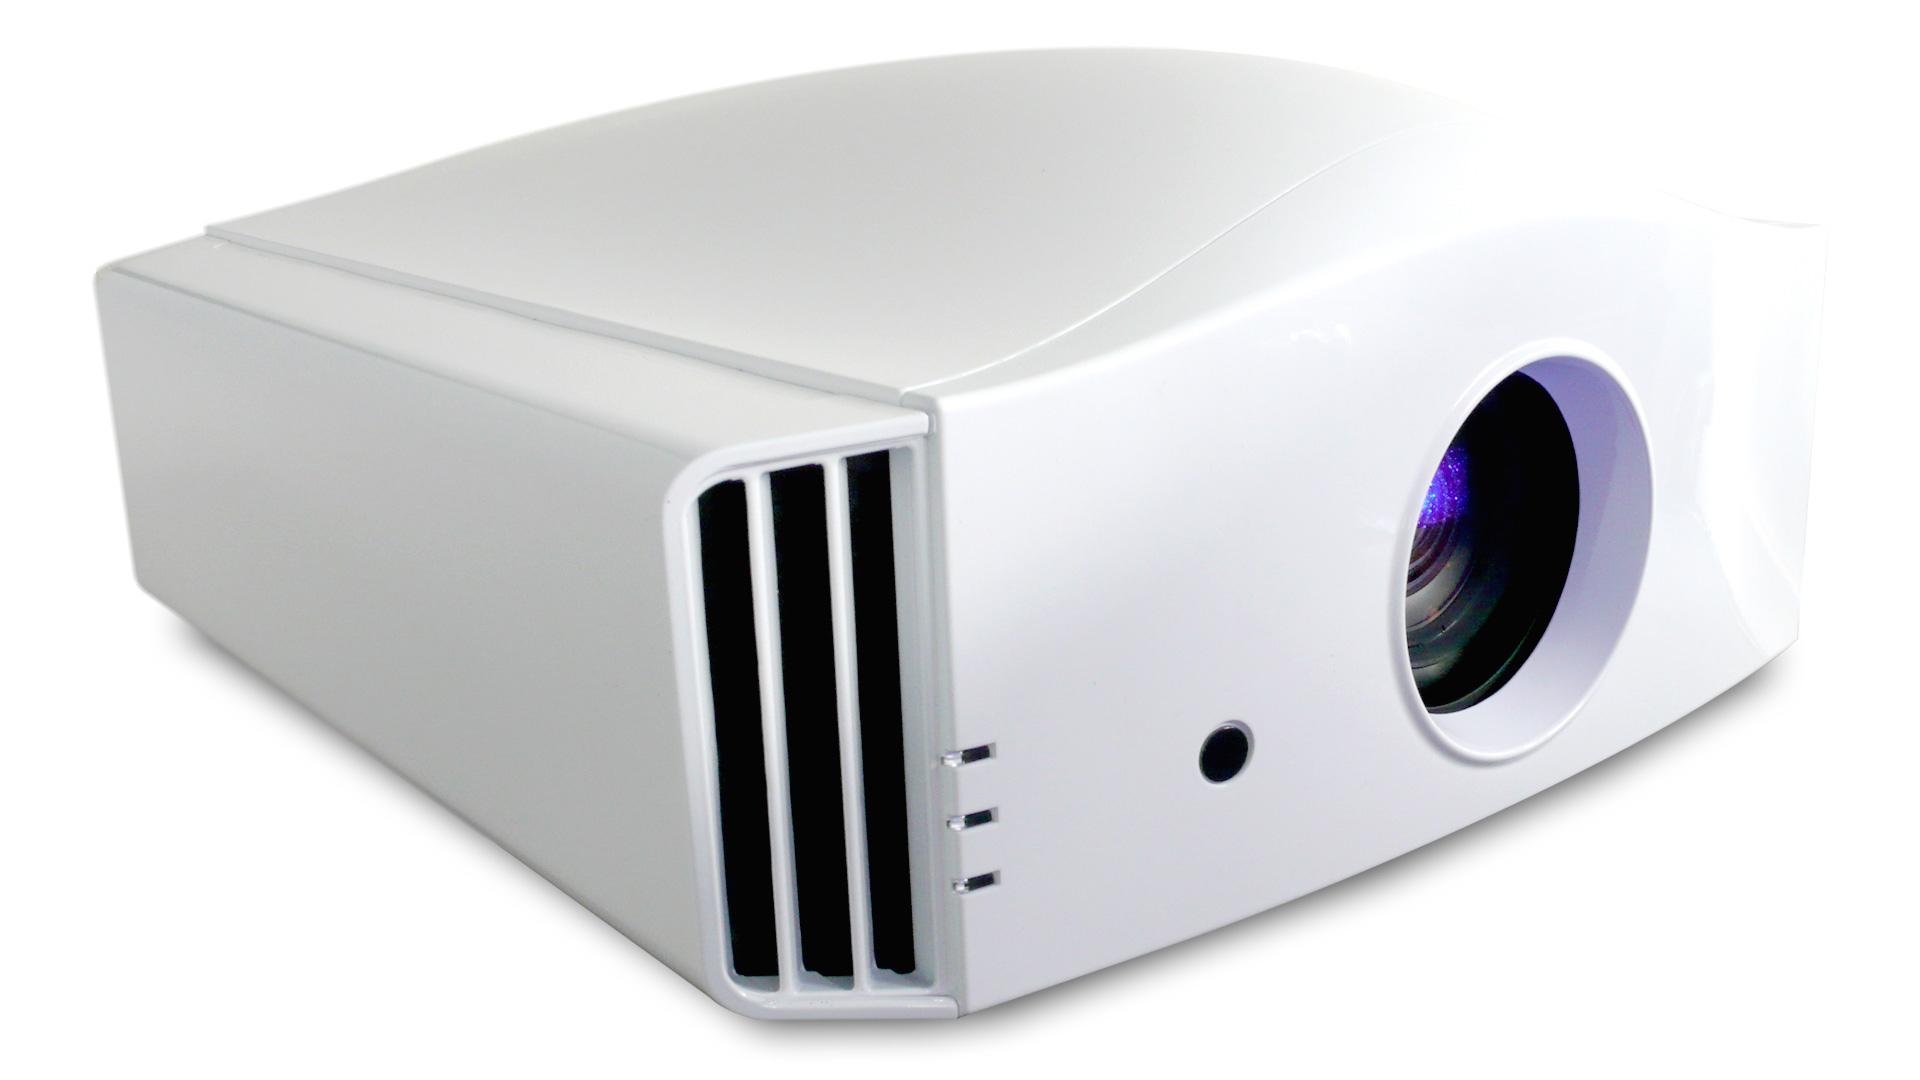 > Siglos 1 4K Active 3D Home Cinema Projector